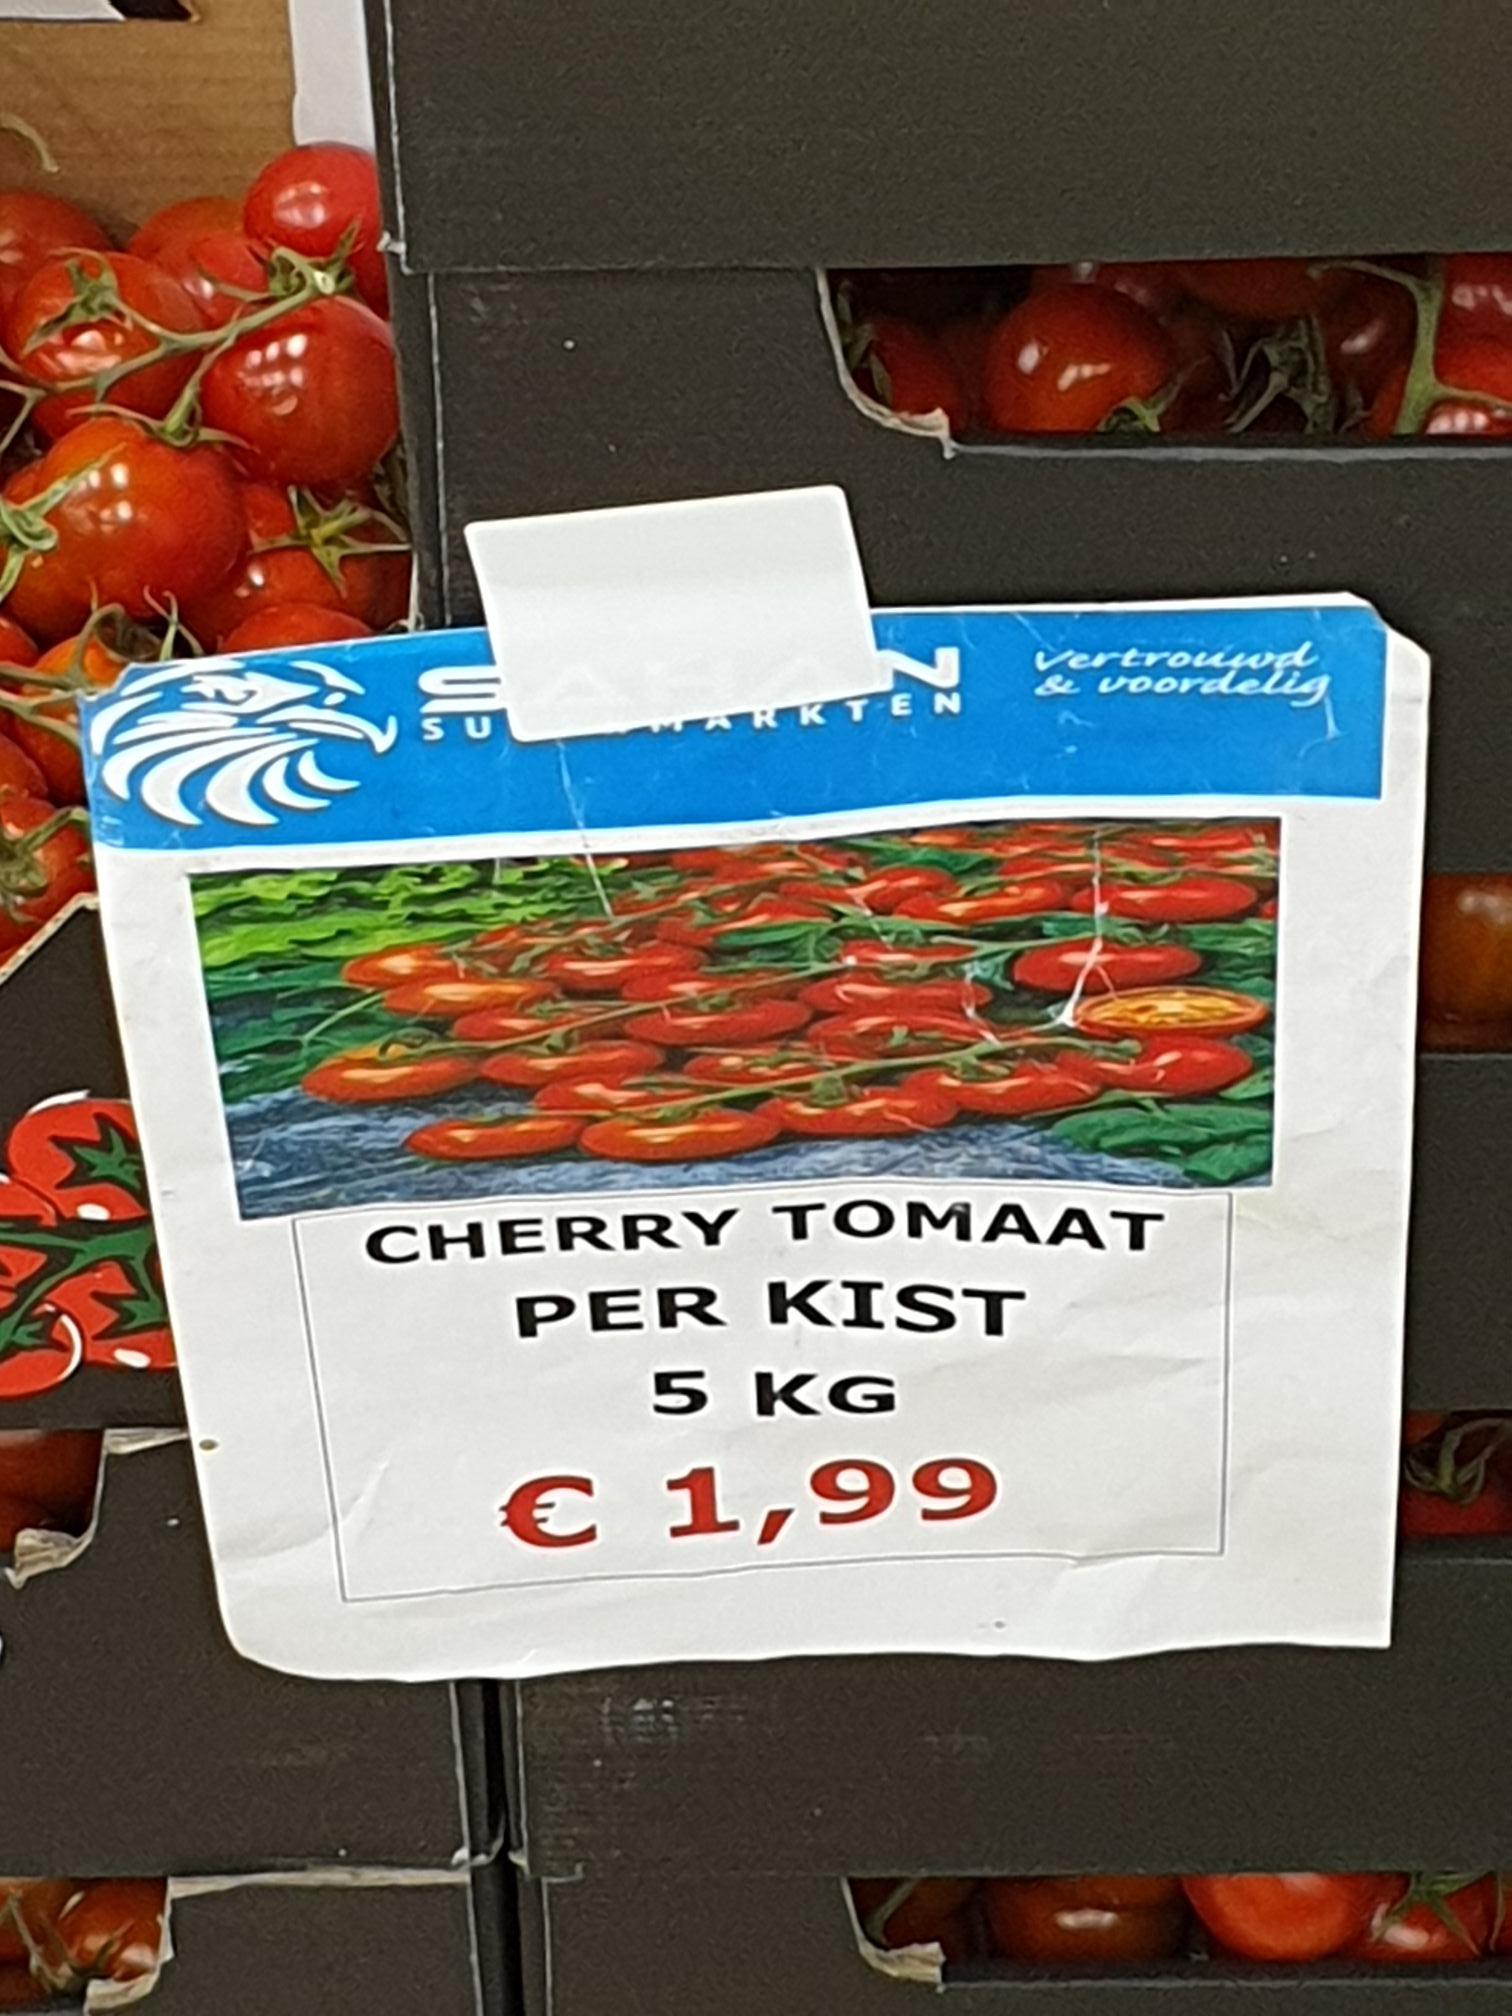 [Waalwijk] 5kg cherrytomaten €1,99